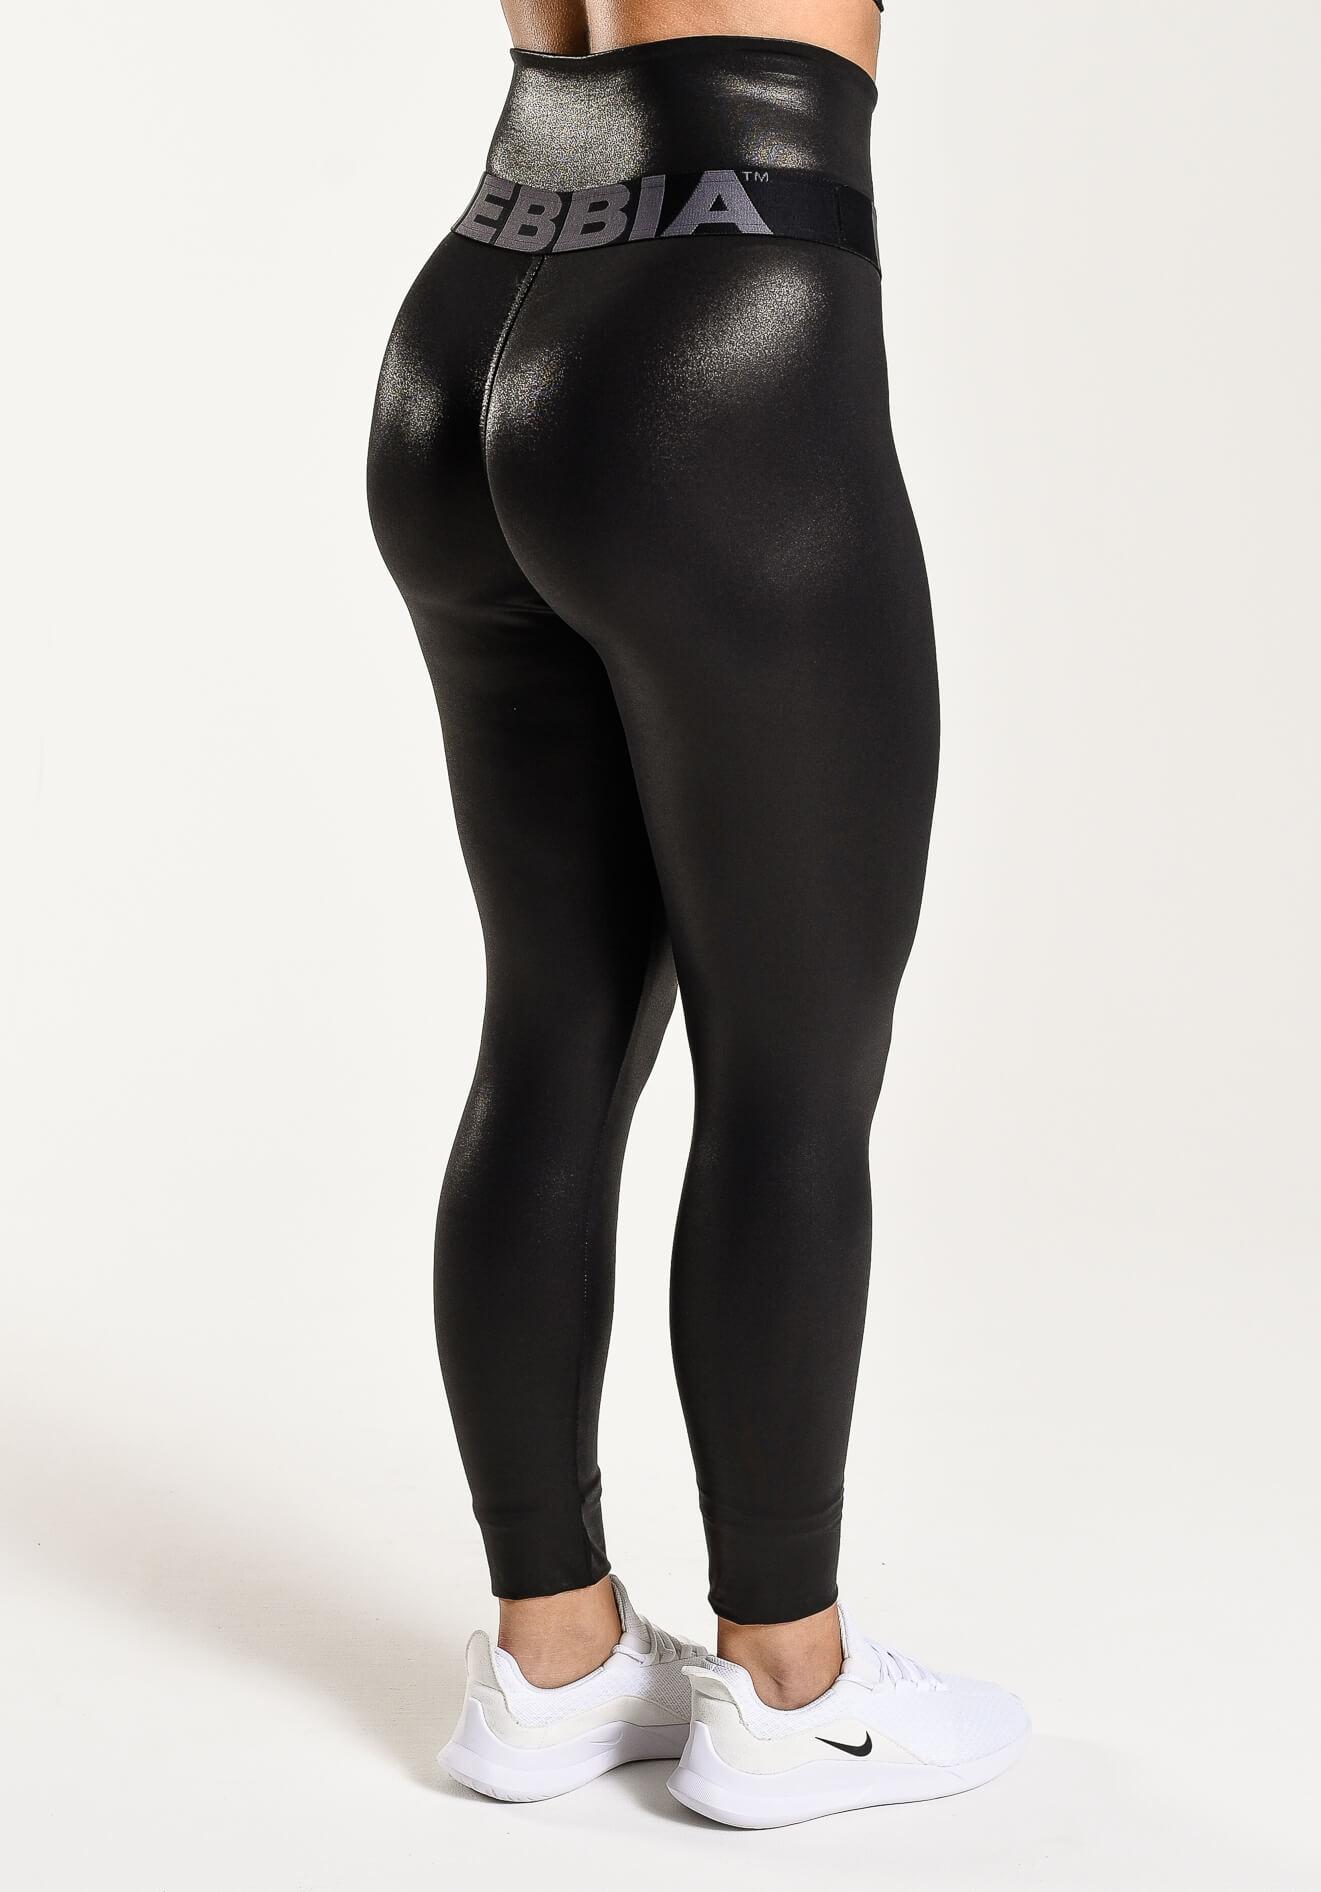 High Waist Glossy Leggings